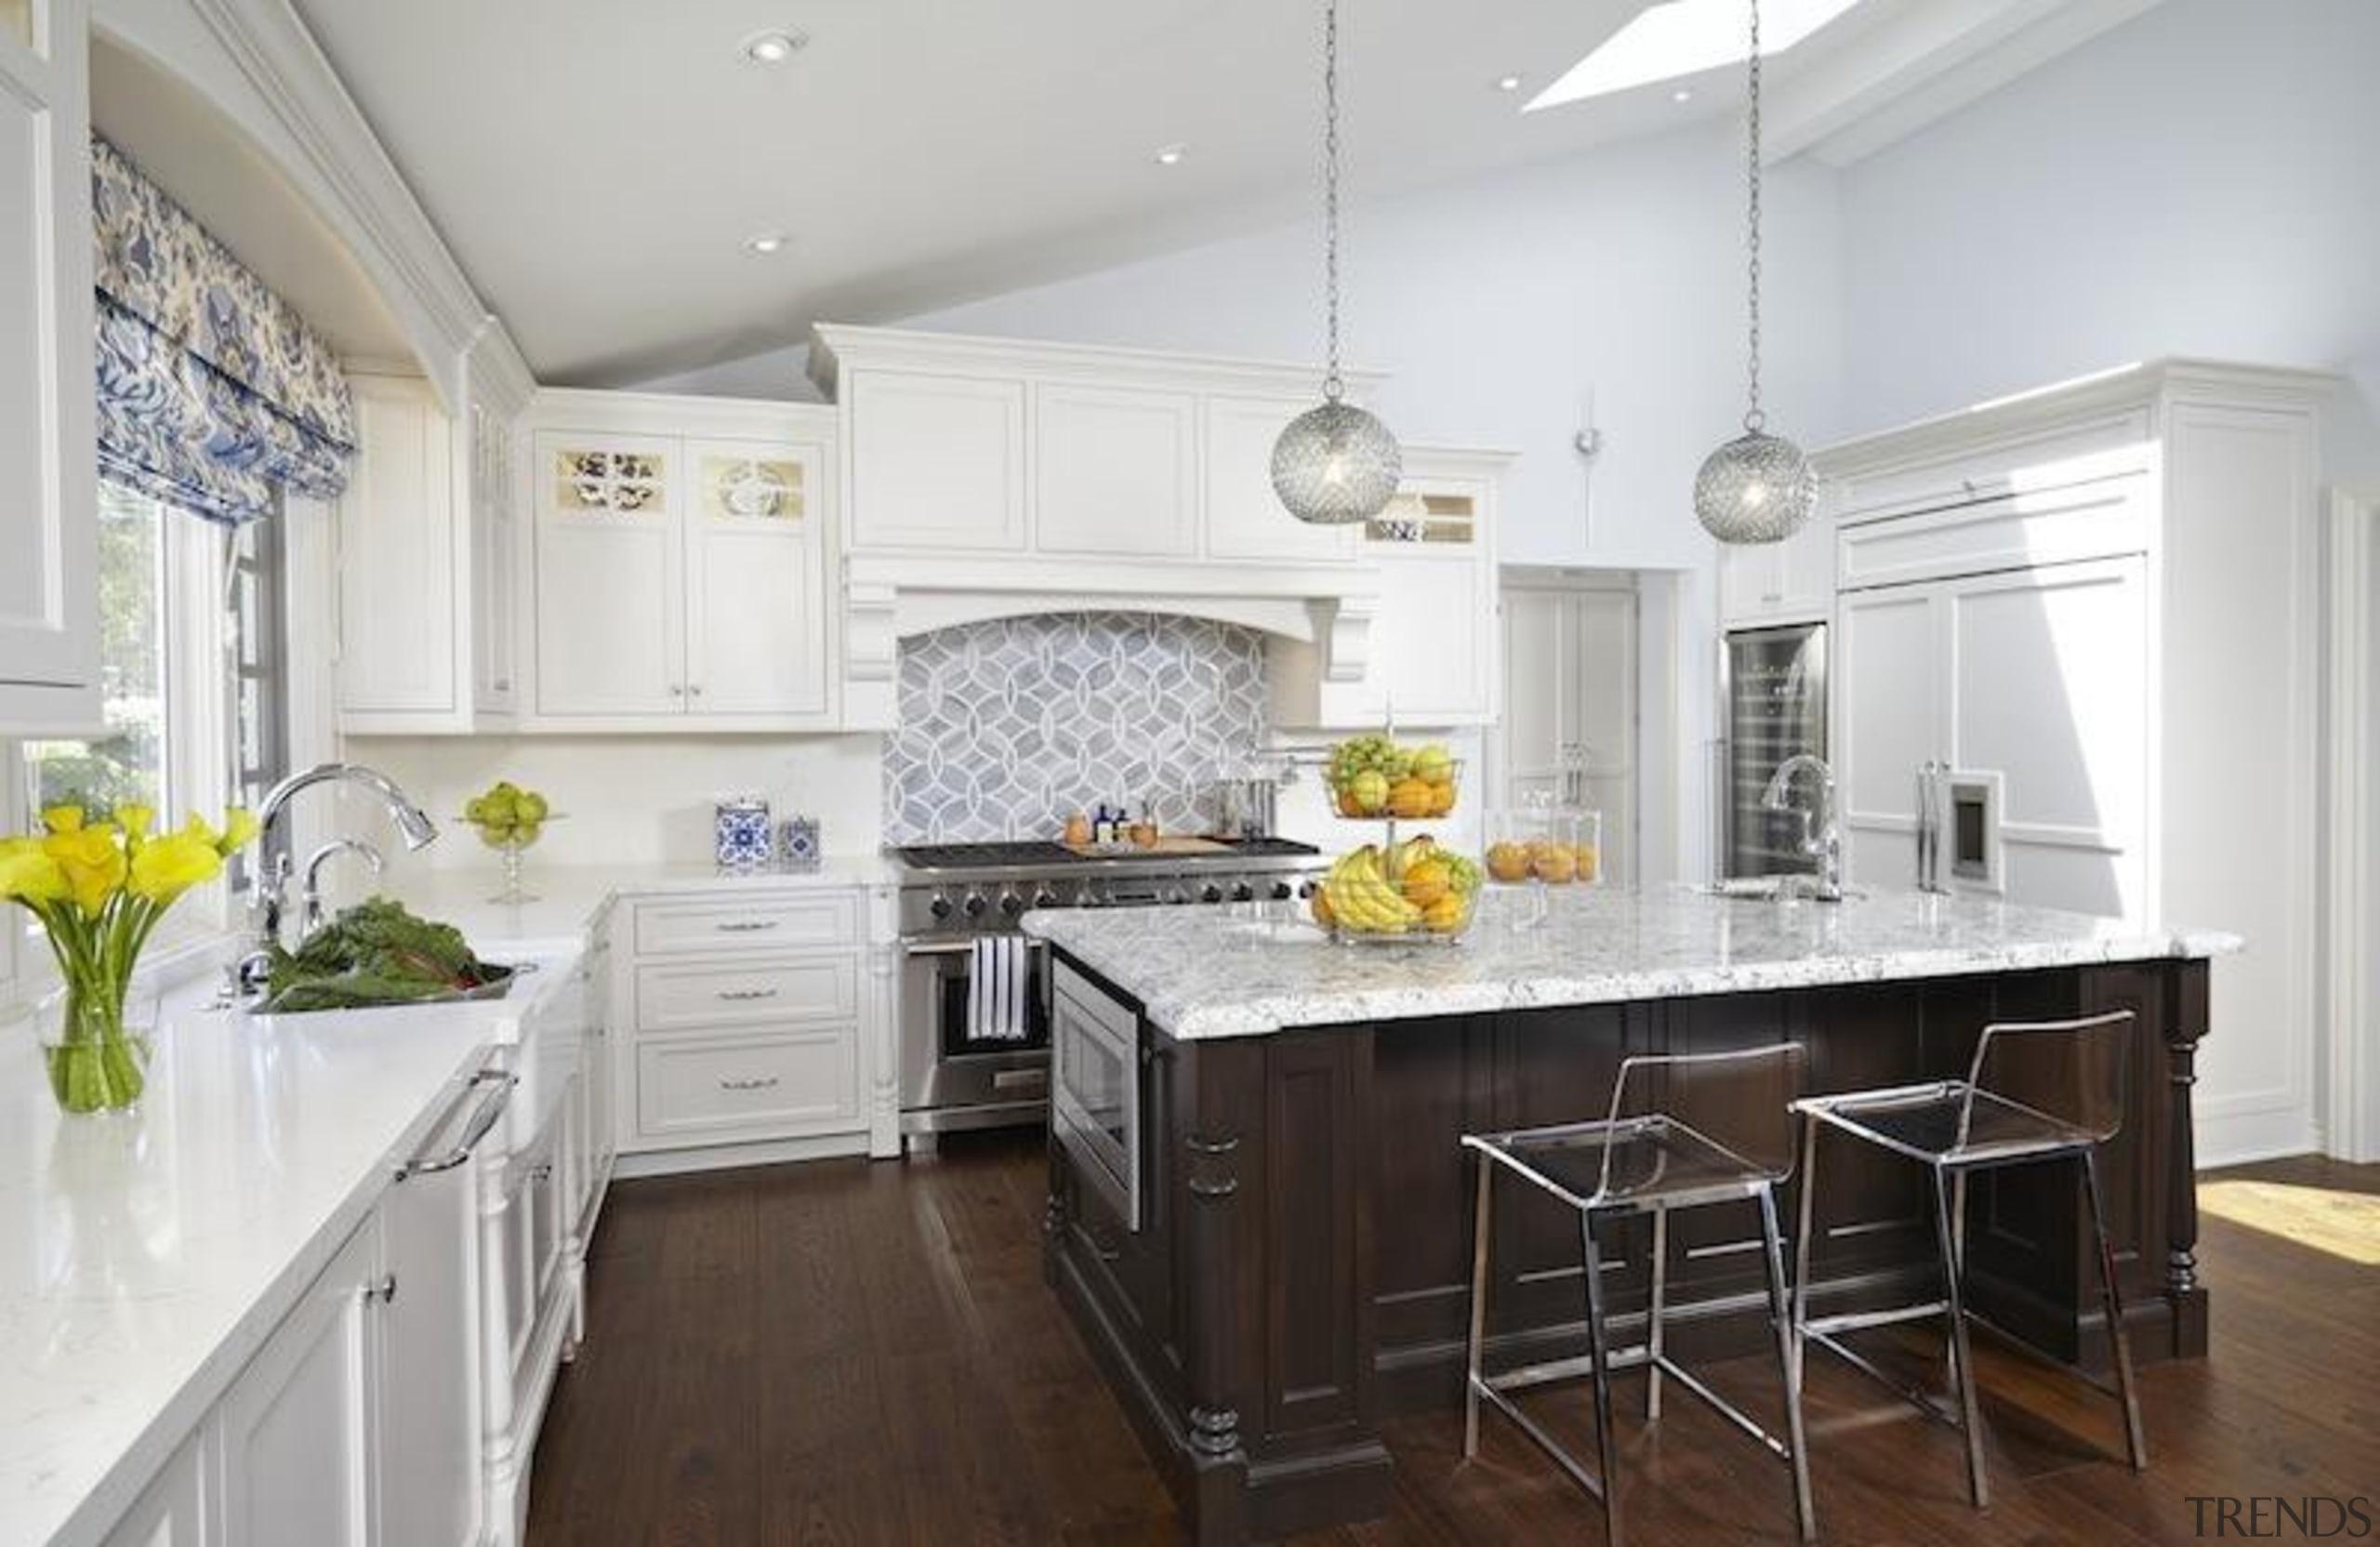 Kitchen Design - Kitchen Design - cabinetry | cabinetry, ceiling, countertop, cuisine classique, floor, home, interior design, kitchen, real estate, room, wood flooring, white, gray